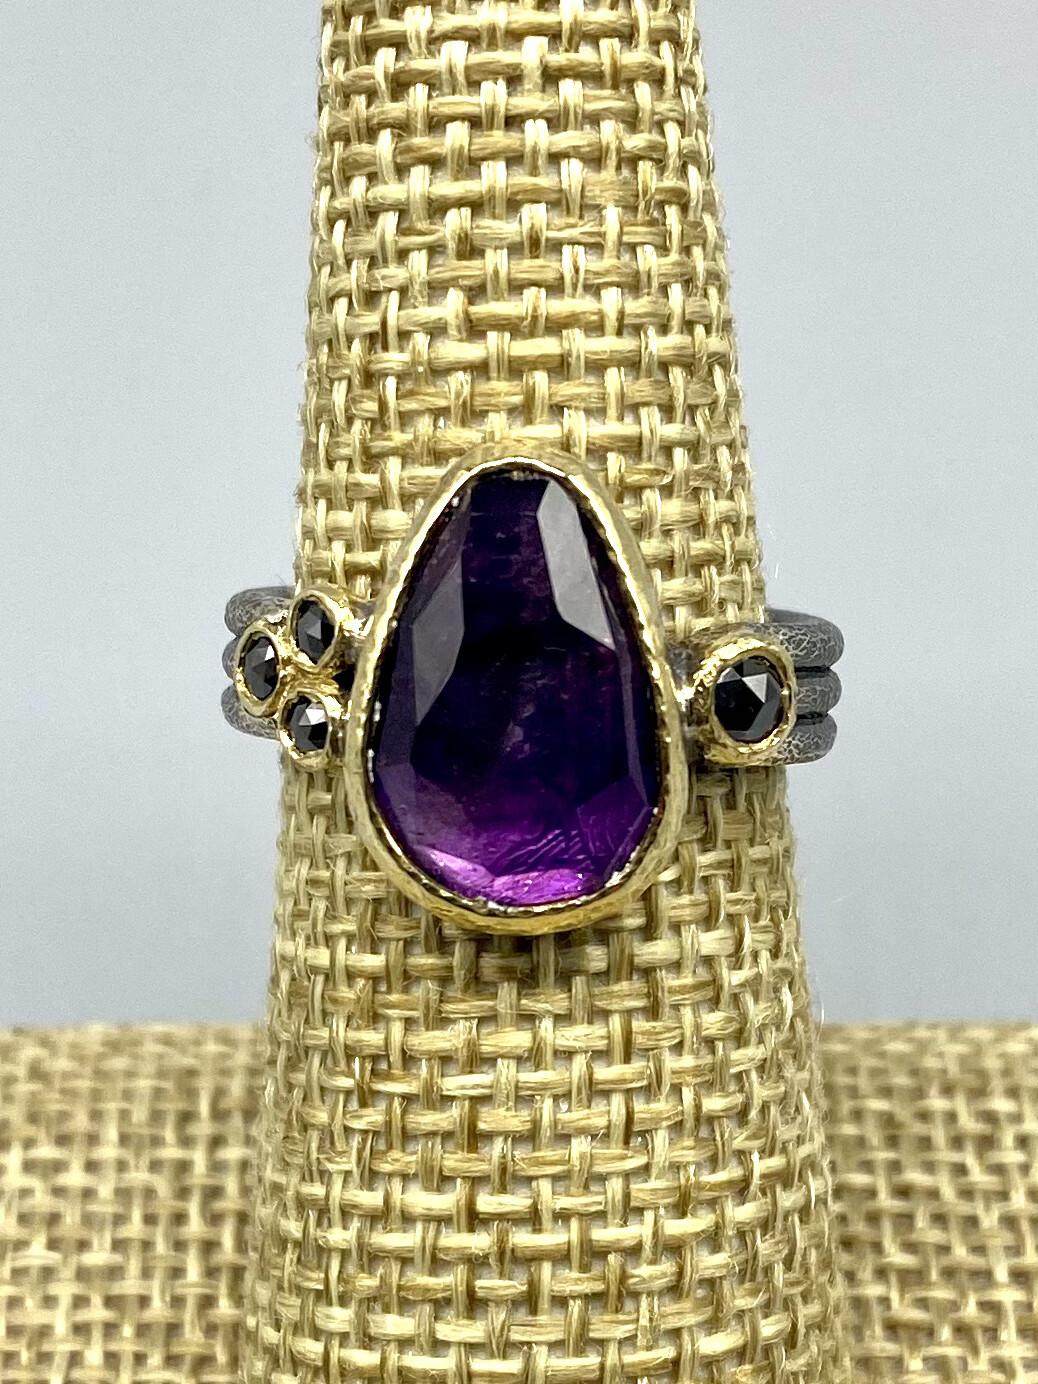 Sz 7.5 Triple Band Amethyst Ring w/Black Diamonds s/s & 18k, Rona Fisher Philadelphia PA